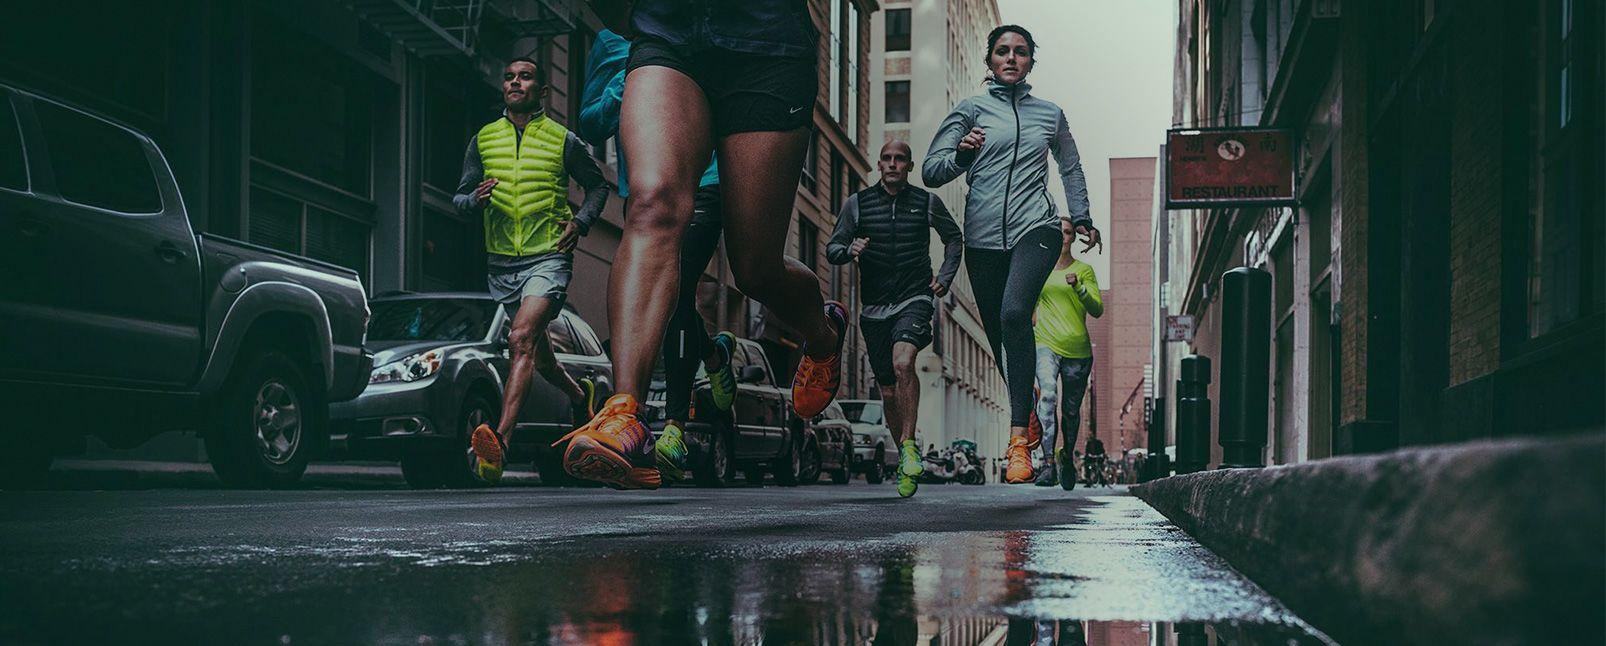 Nike, Inc.'s mission